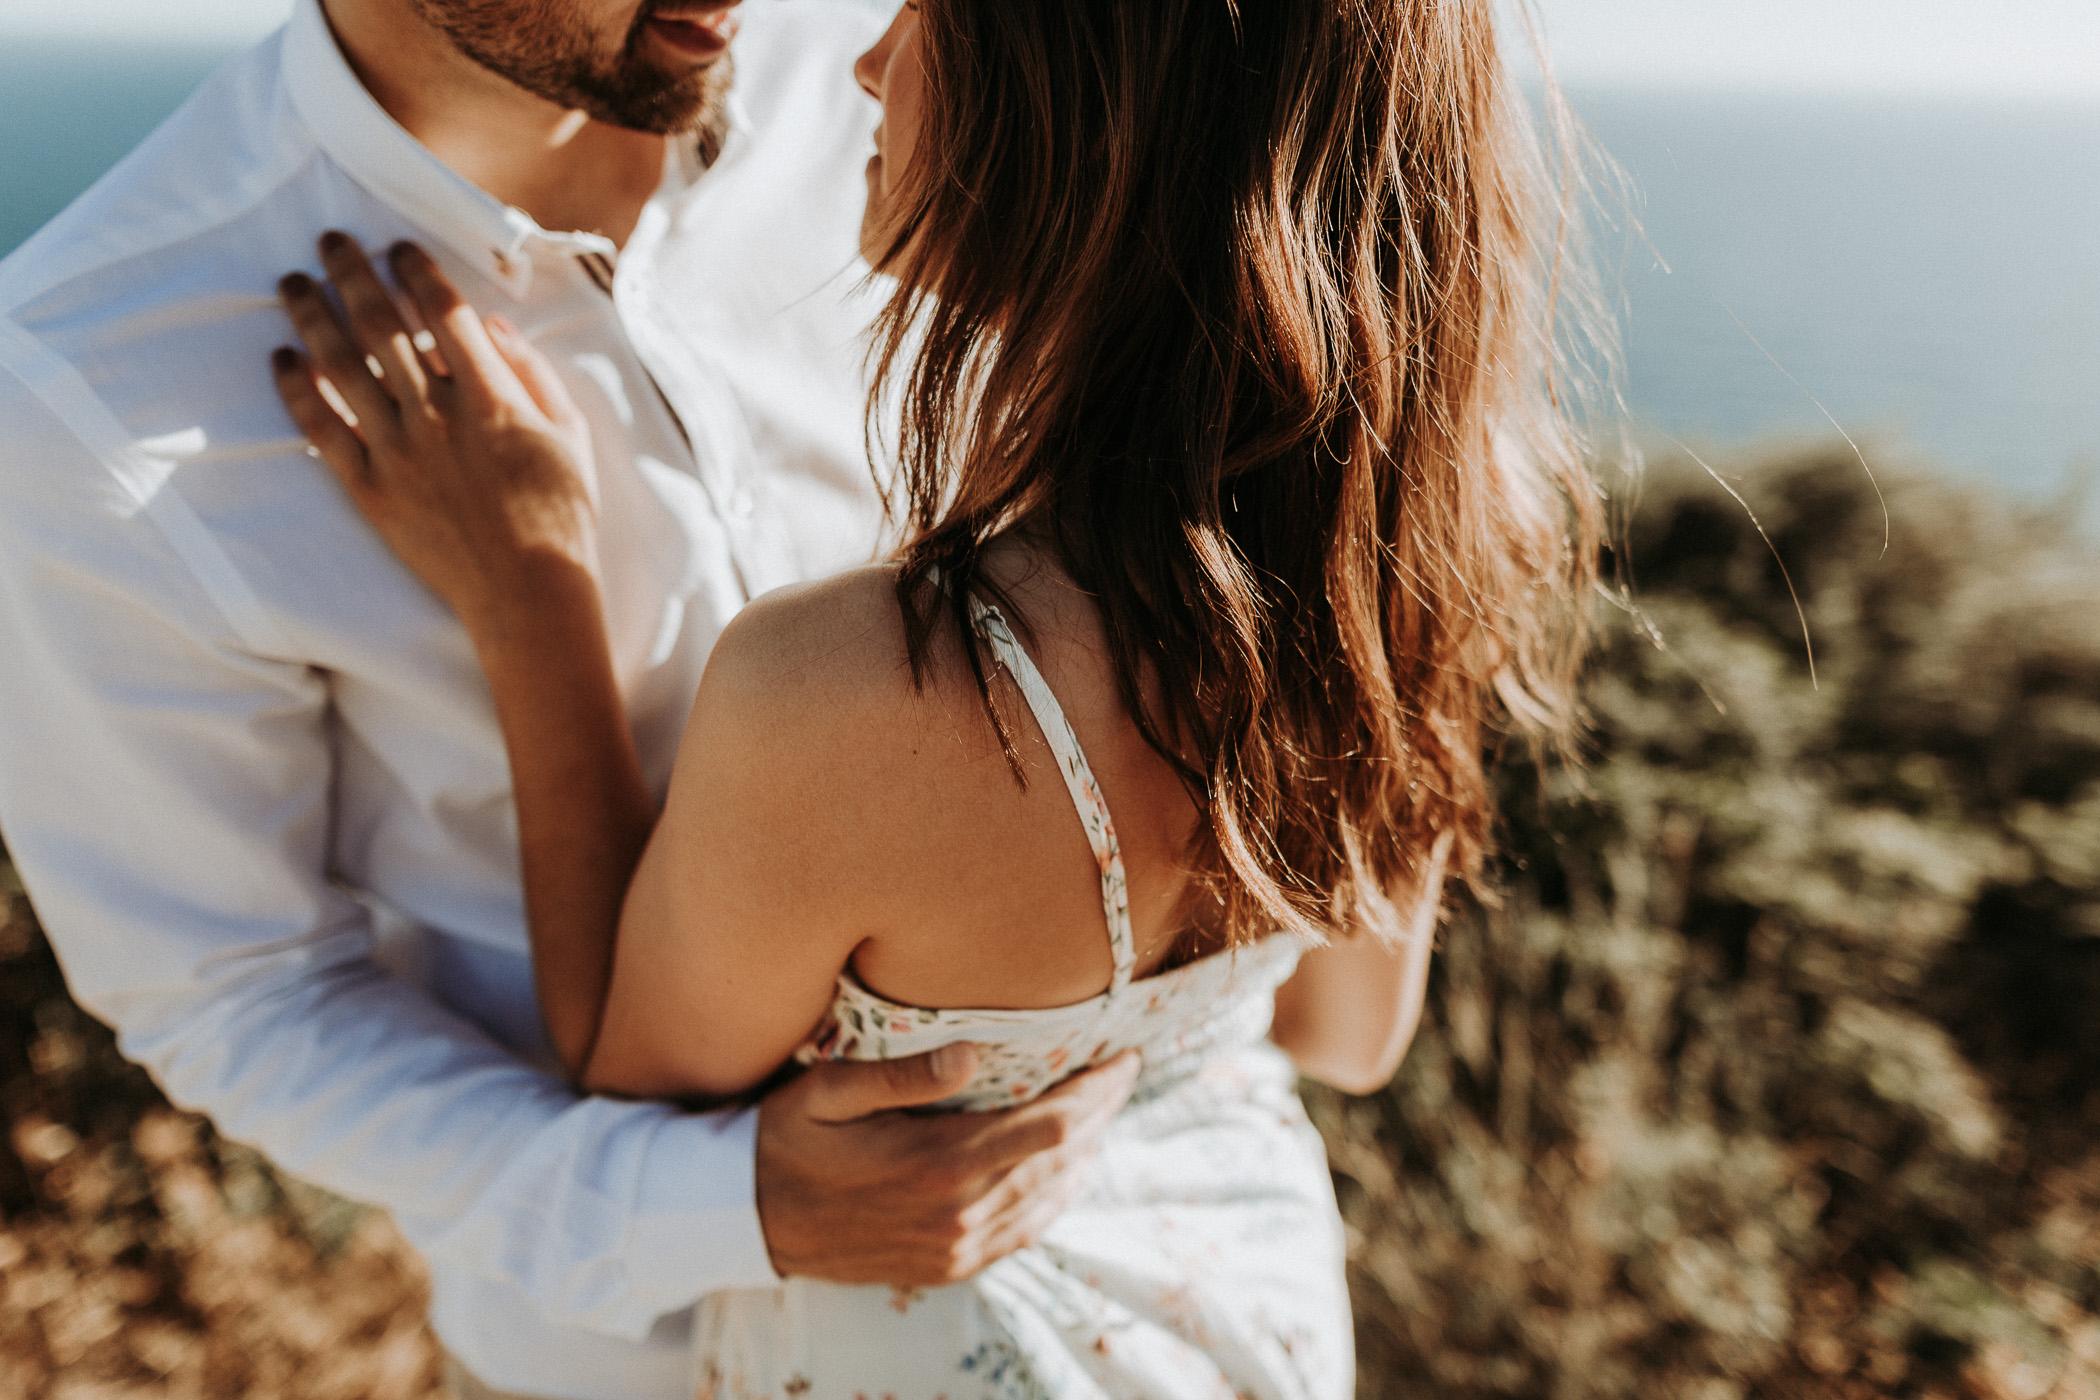 DanielaMarquardtPhotography_wedding_elopement_mallorca_spain_calapi_palma_lauraandtoni_139